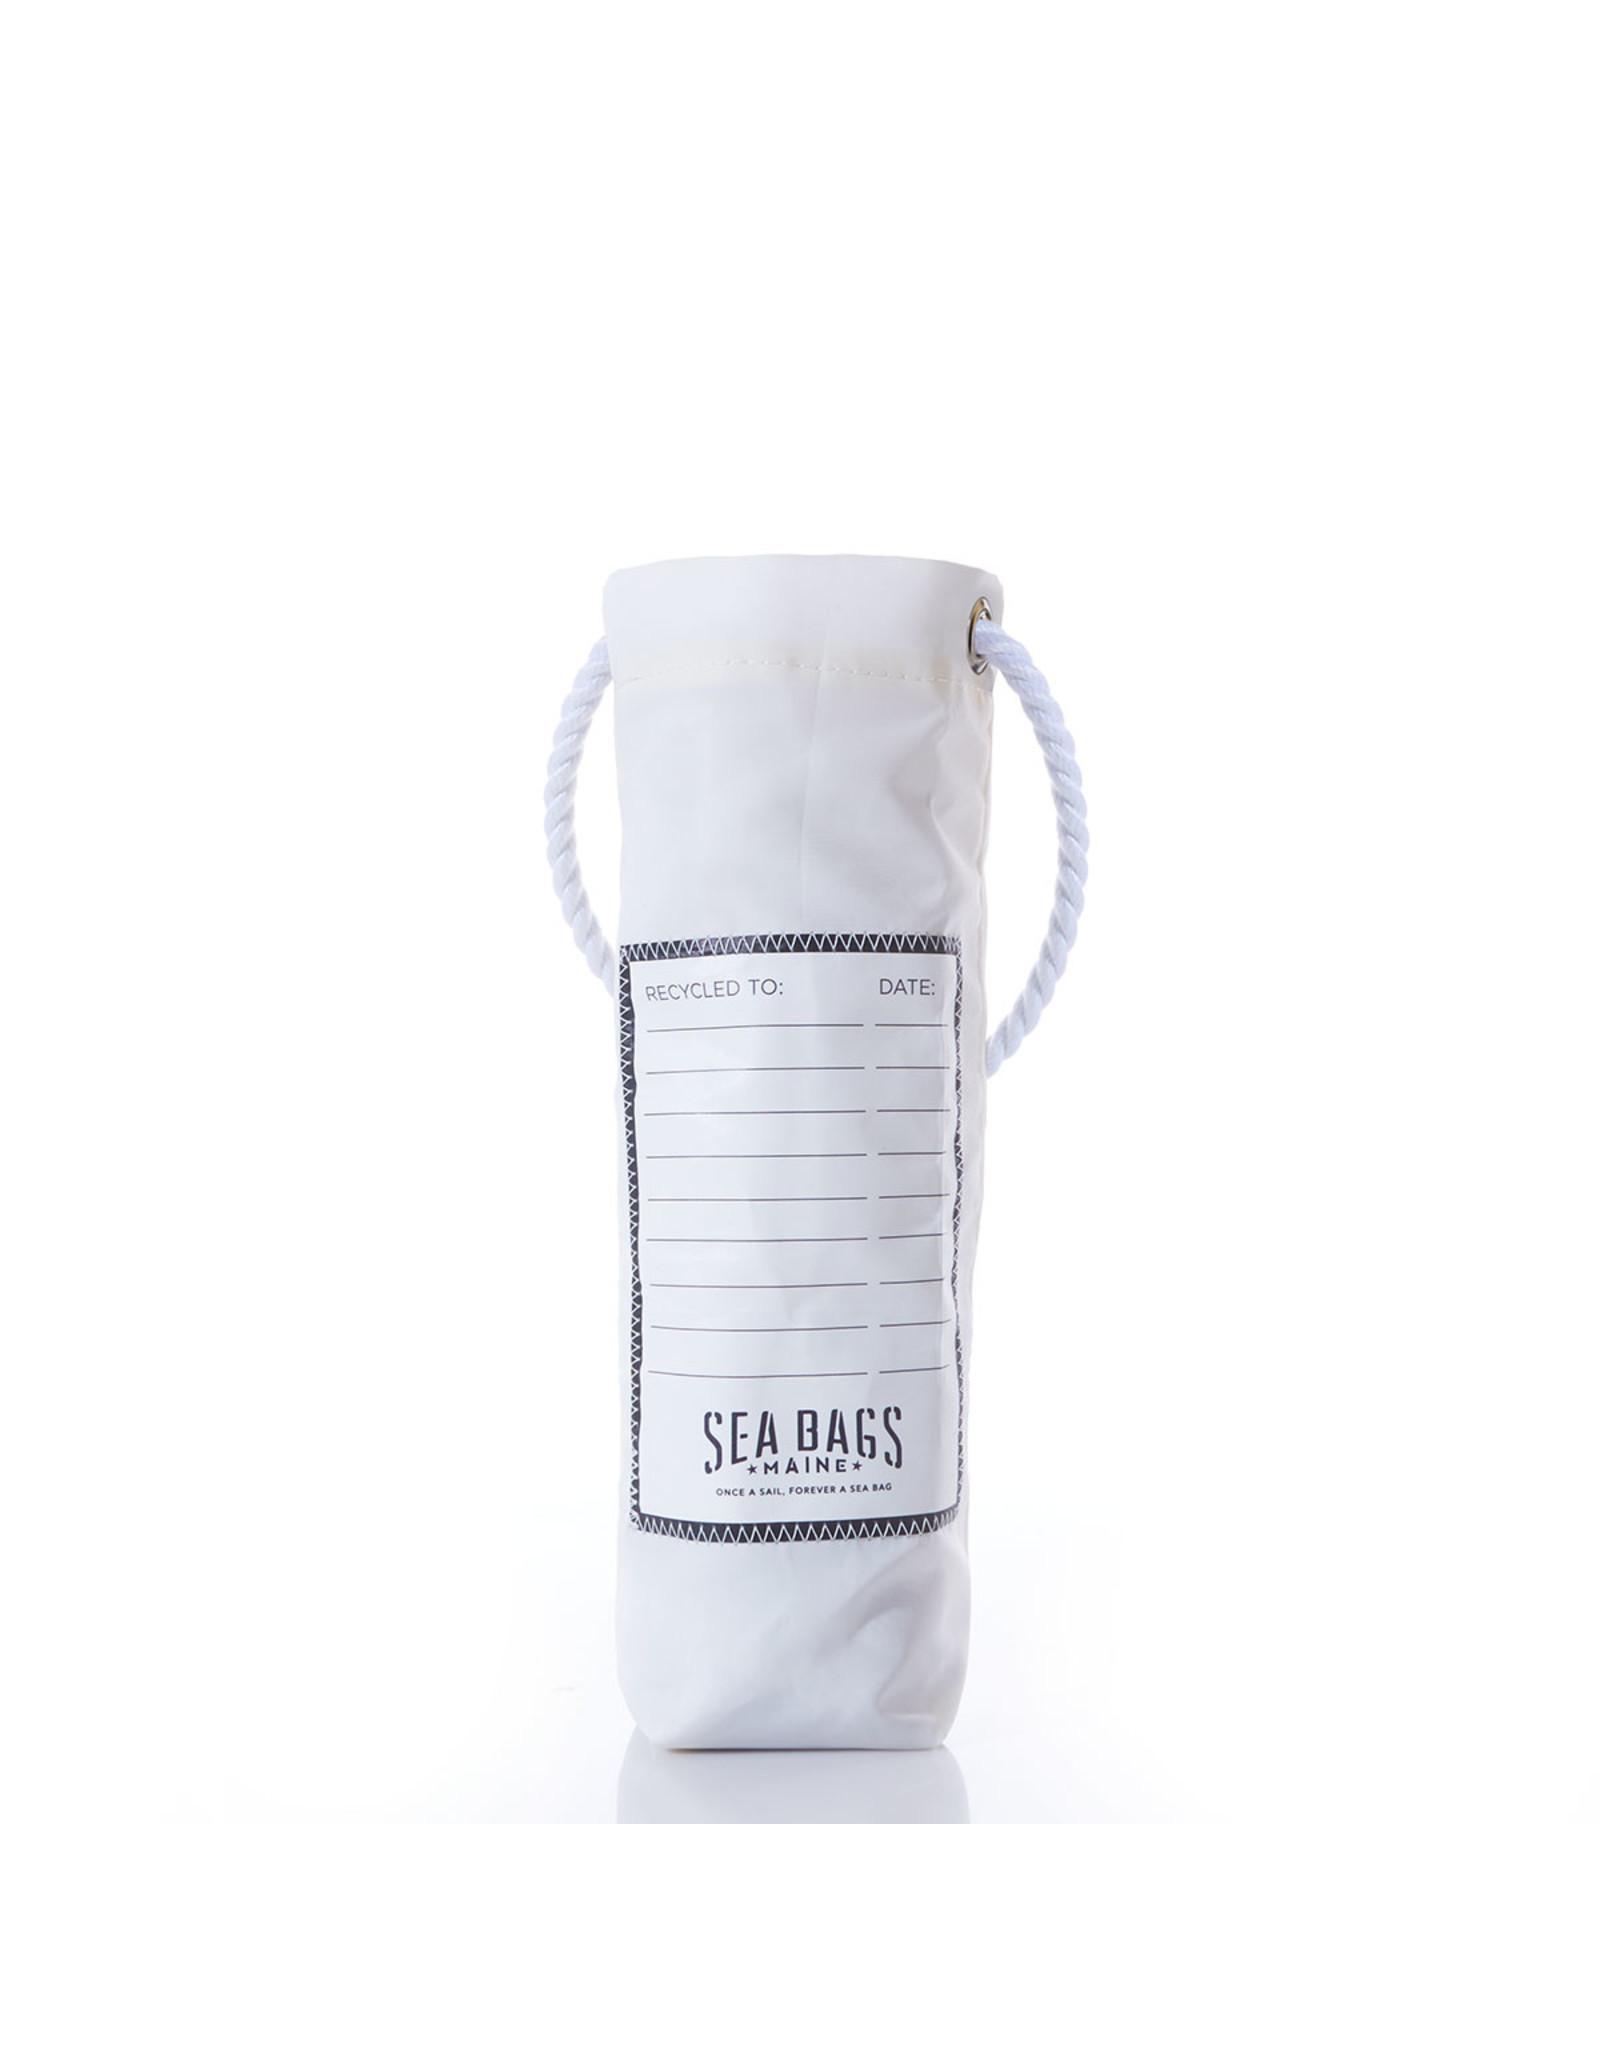 Sea Bag Wine Bag